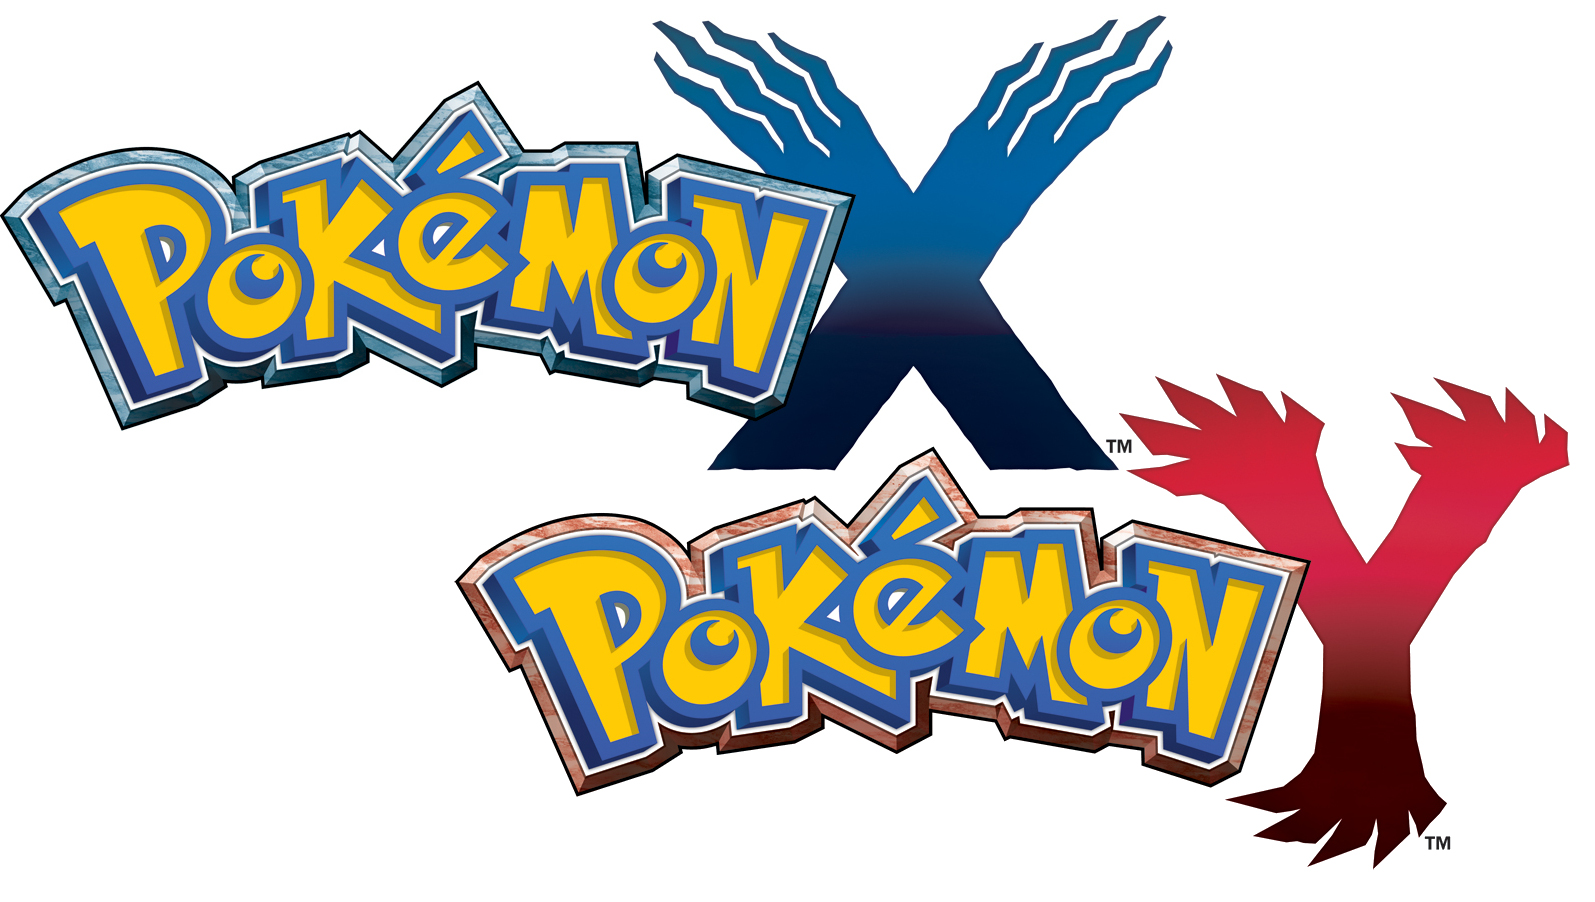 Pokemon_X_ja_Y